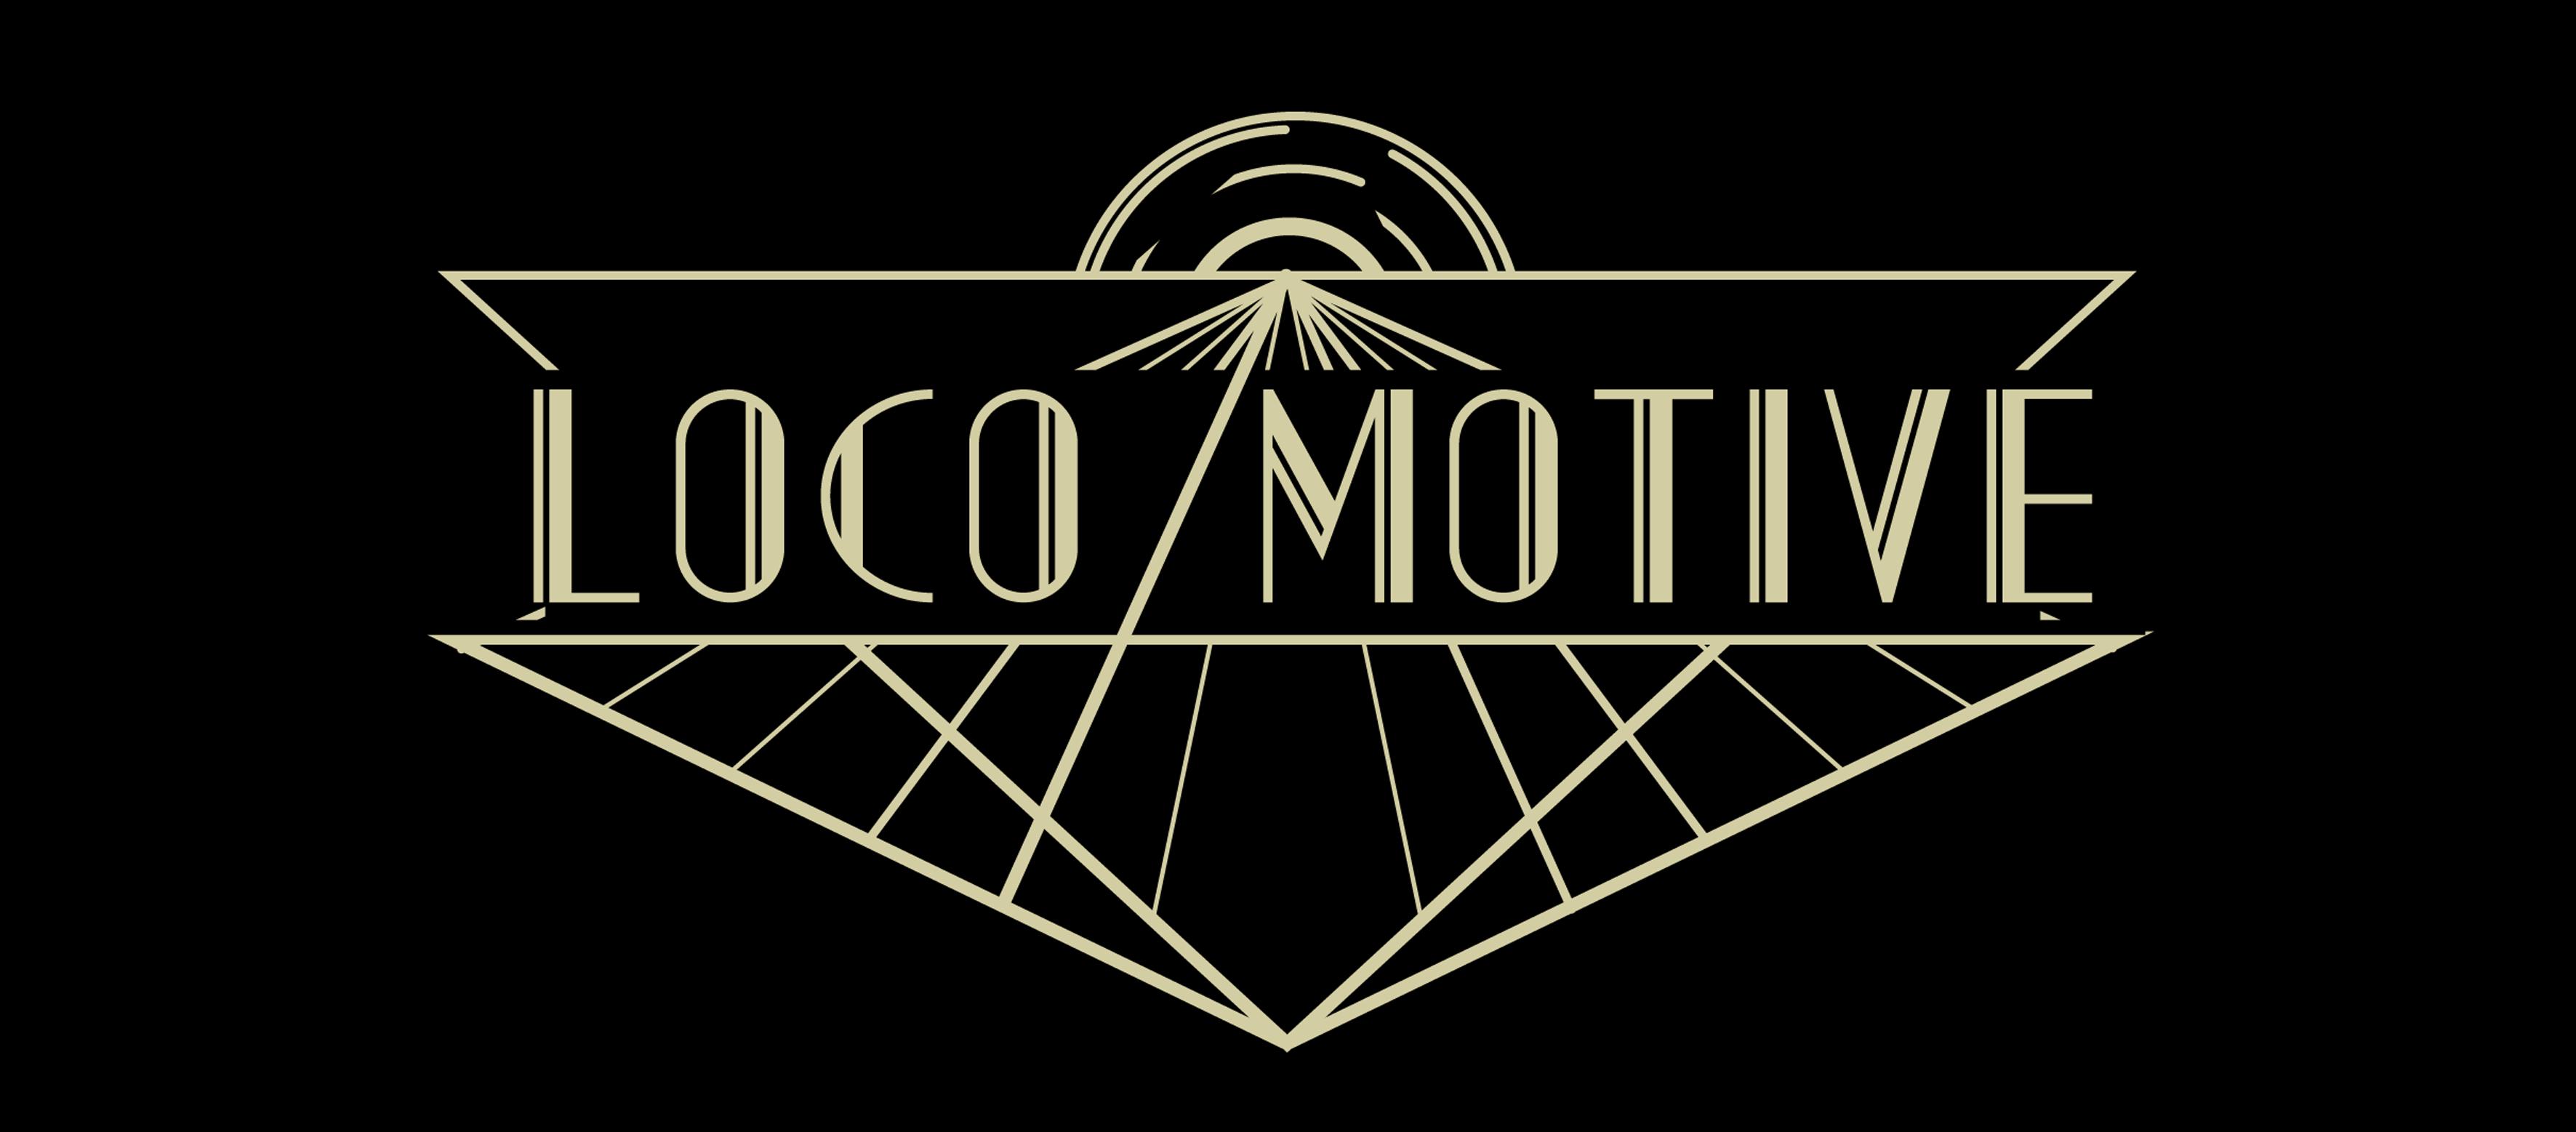 Loco/Motive